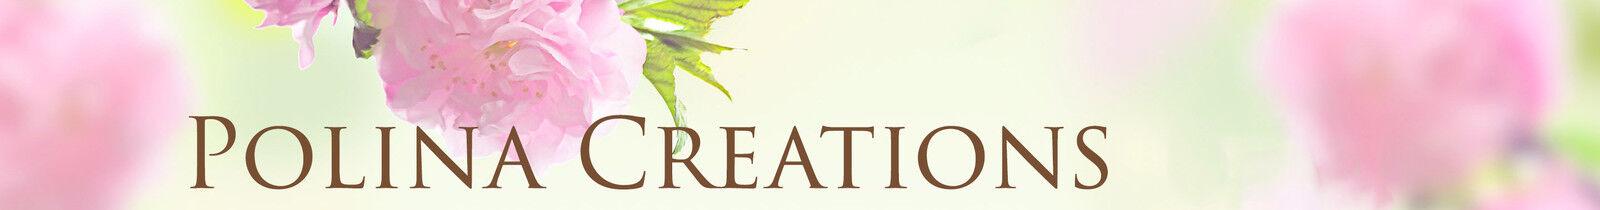 Polinas Creations